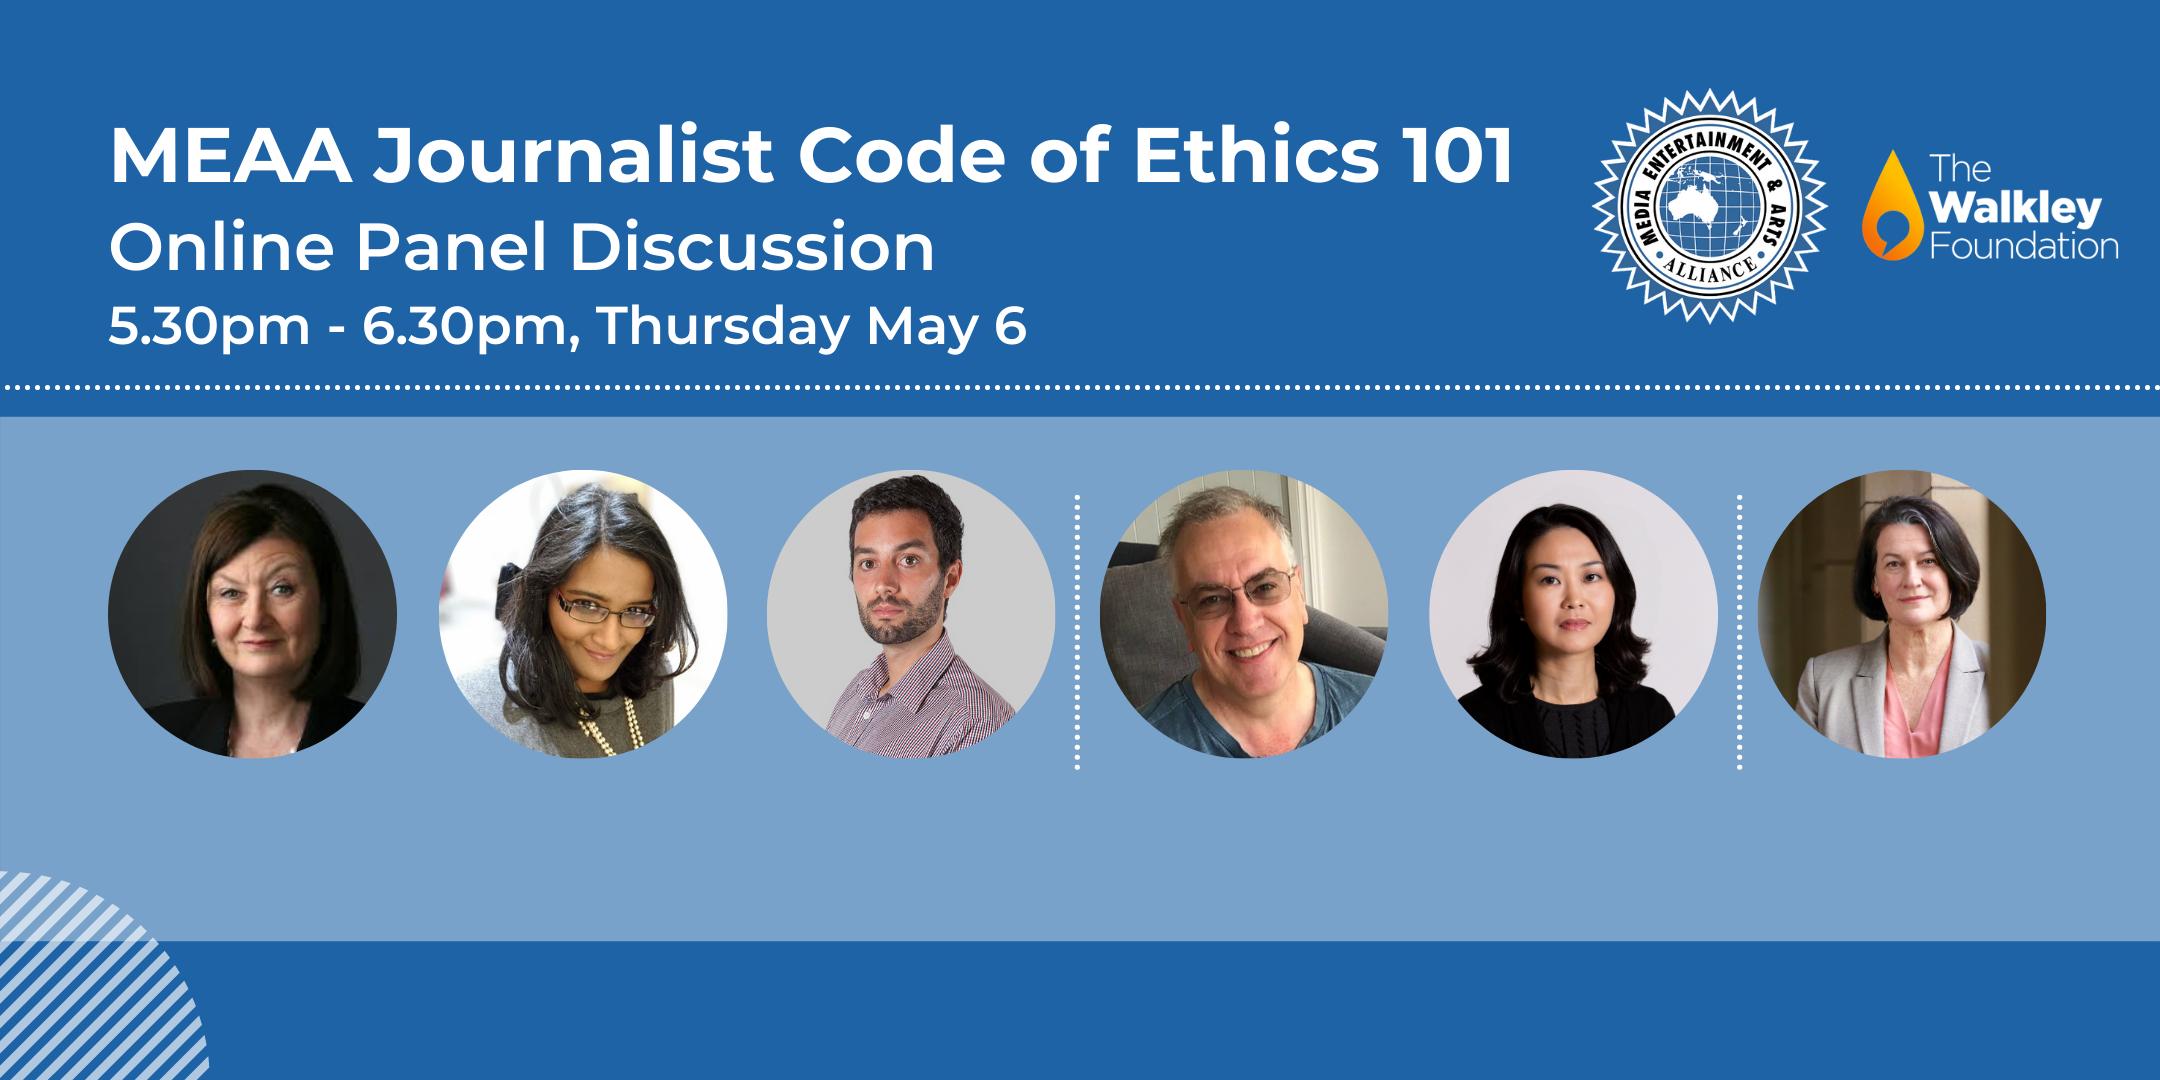 MEAA Journalist Code of Ethics 101